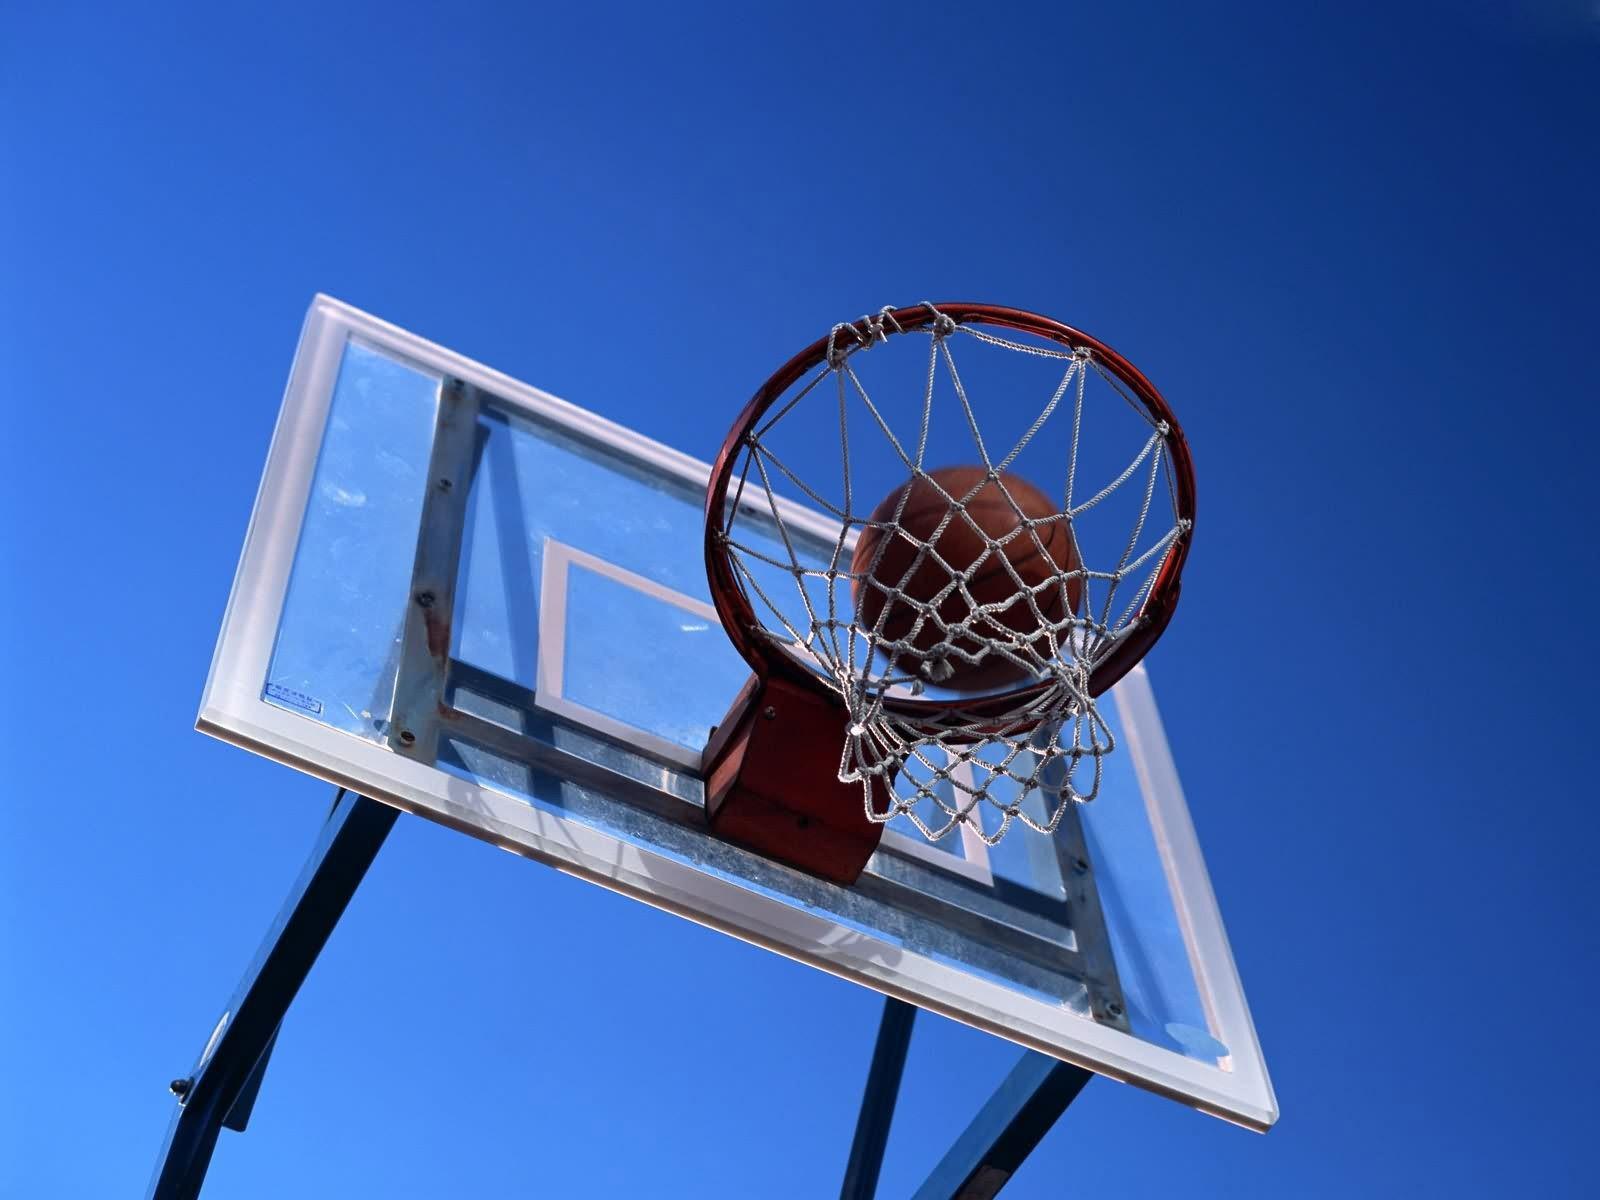 1418858804_nba-evrokubok-basketbol-bukmekerskie-live-stavki-sport-prognoz-online